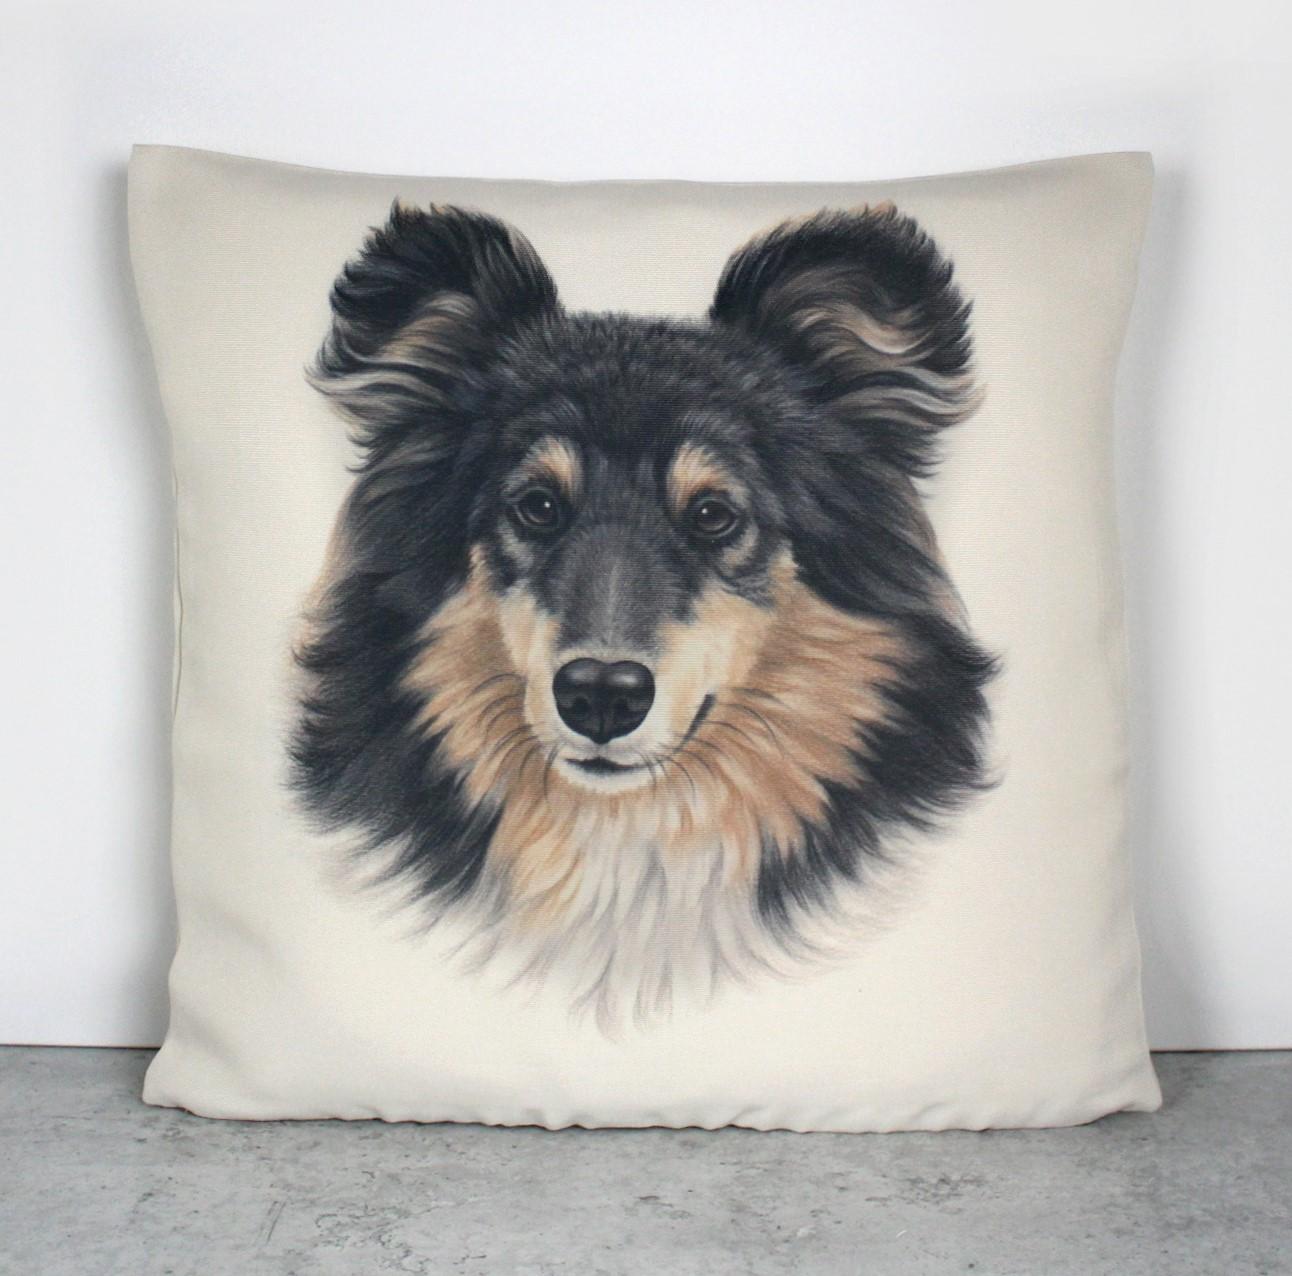 Collie Tricolor -Sisustustyyny (Koirarodut)